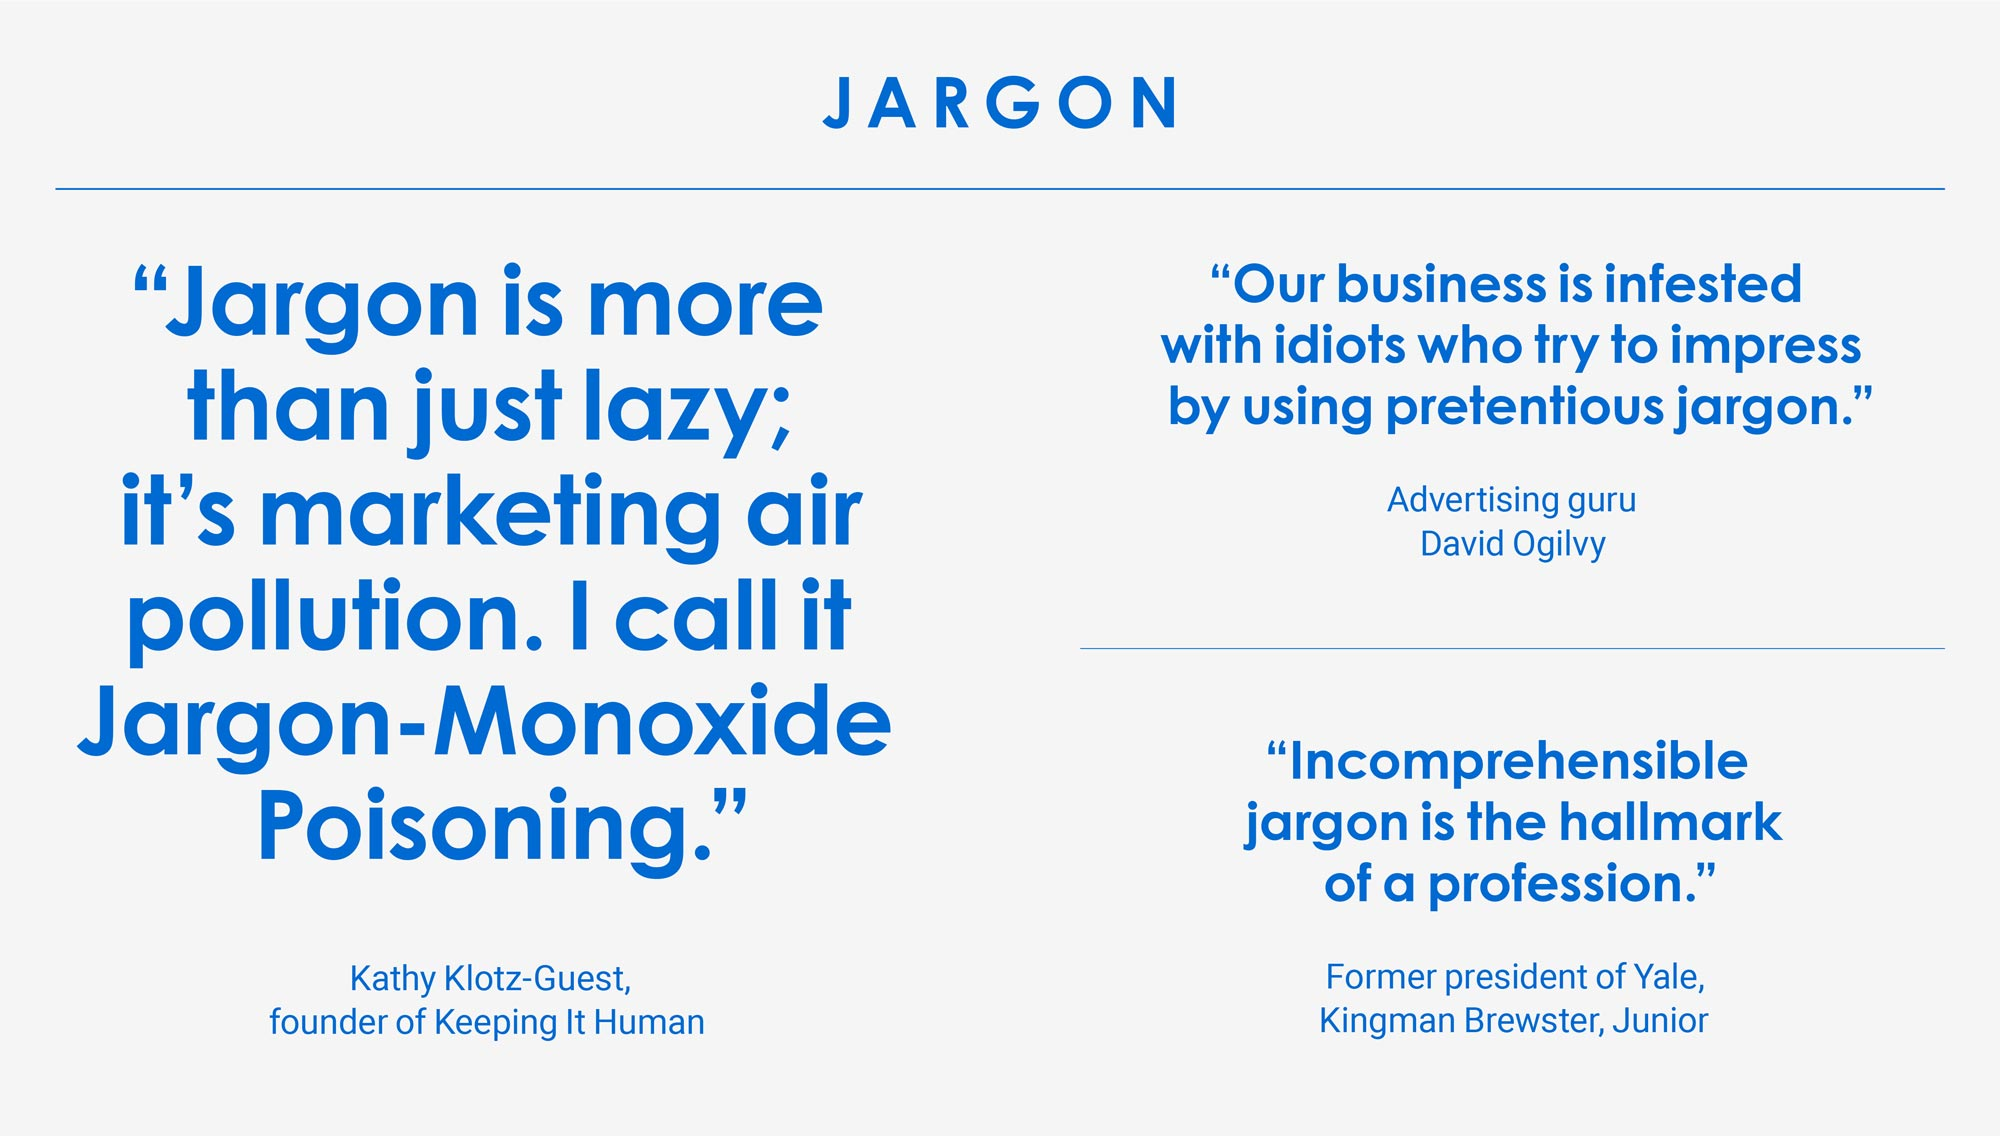 02. Jargon (Insight Agents)